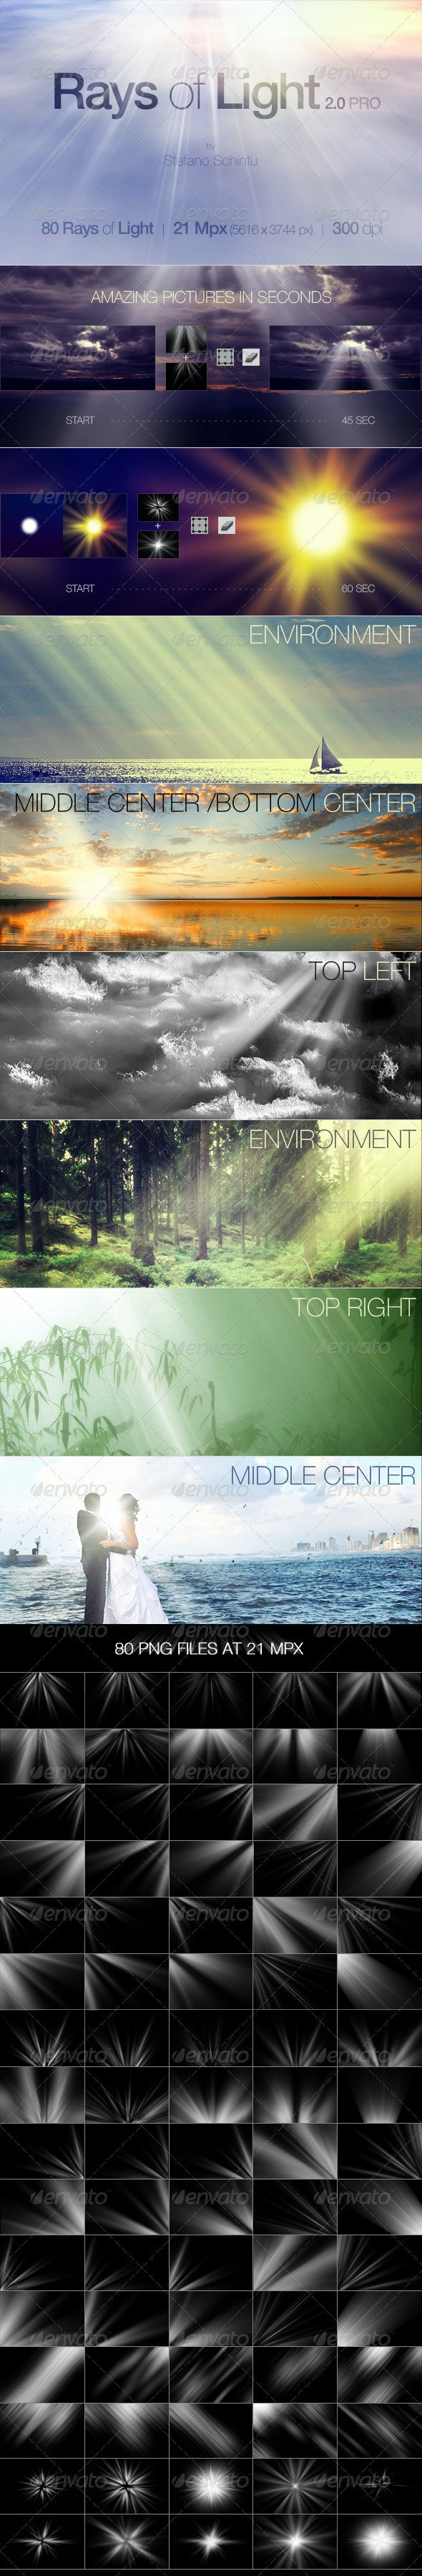 Ray of Light v2.0 PRO + Sun Action Bundle - Graphics